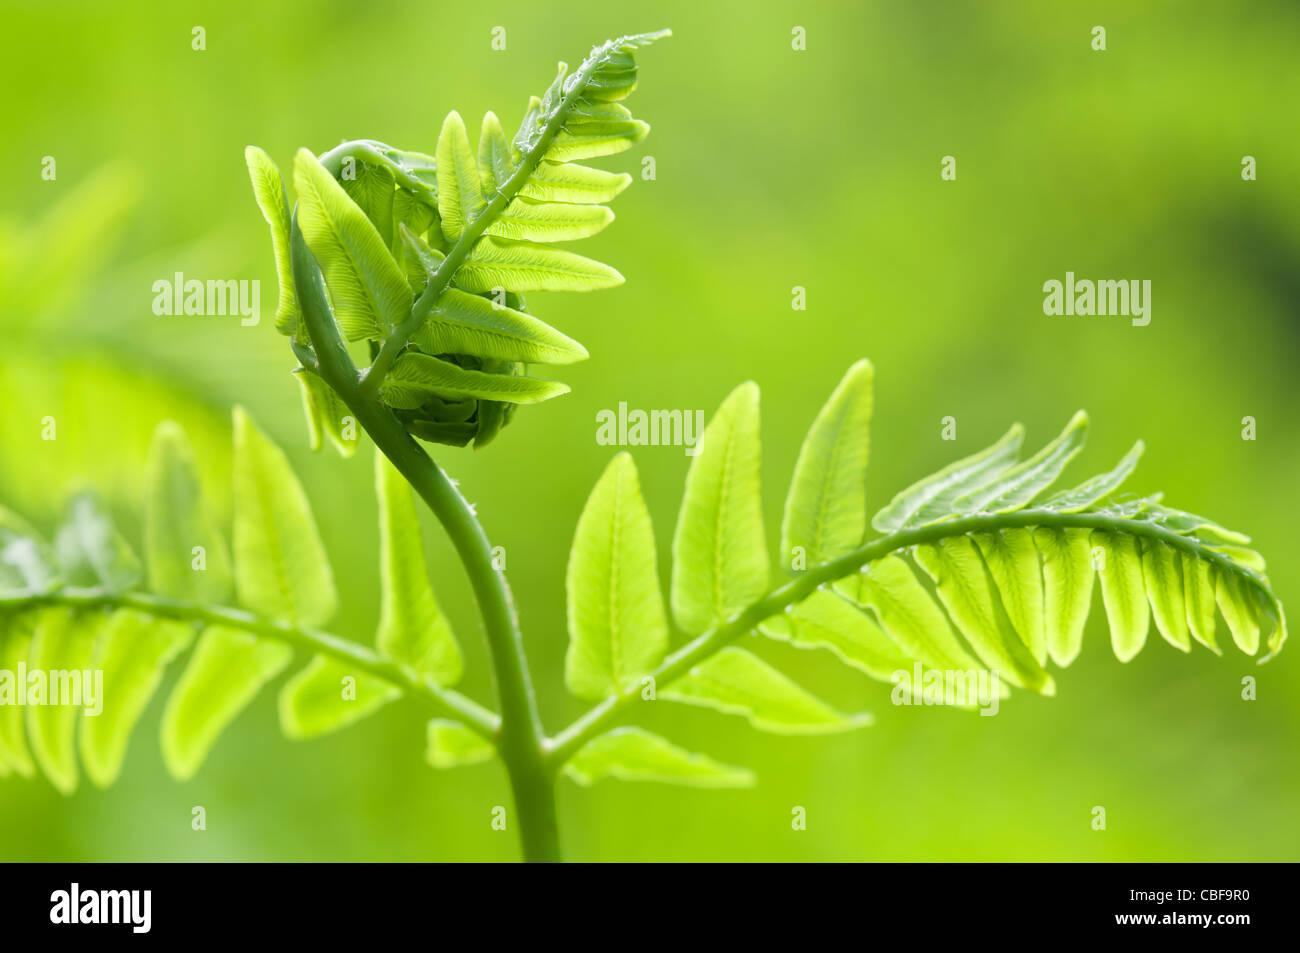 Osmunda Regalis, Farn Blatt keimhaft, grünes Thema, grünen Hintergrund. Stockbild